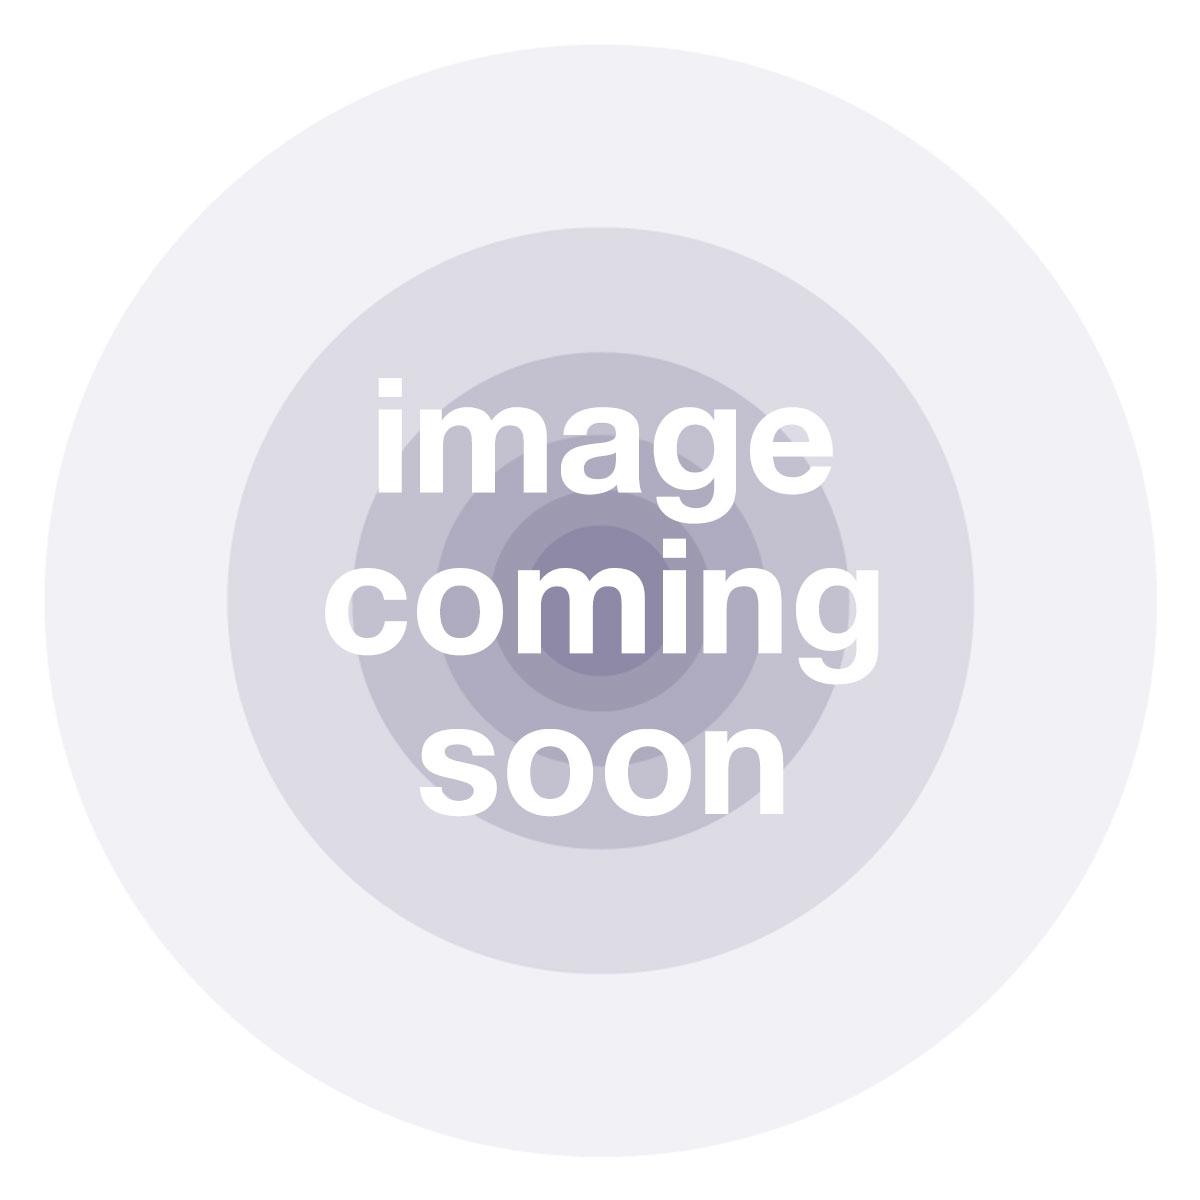 McDSP FilterBank Plugin